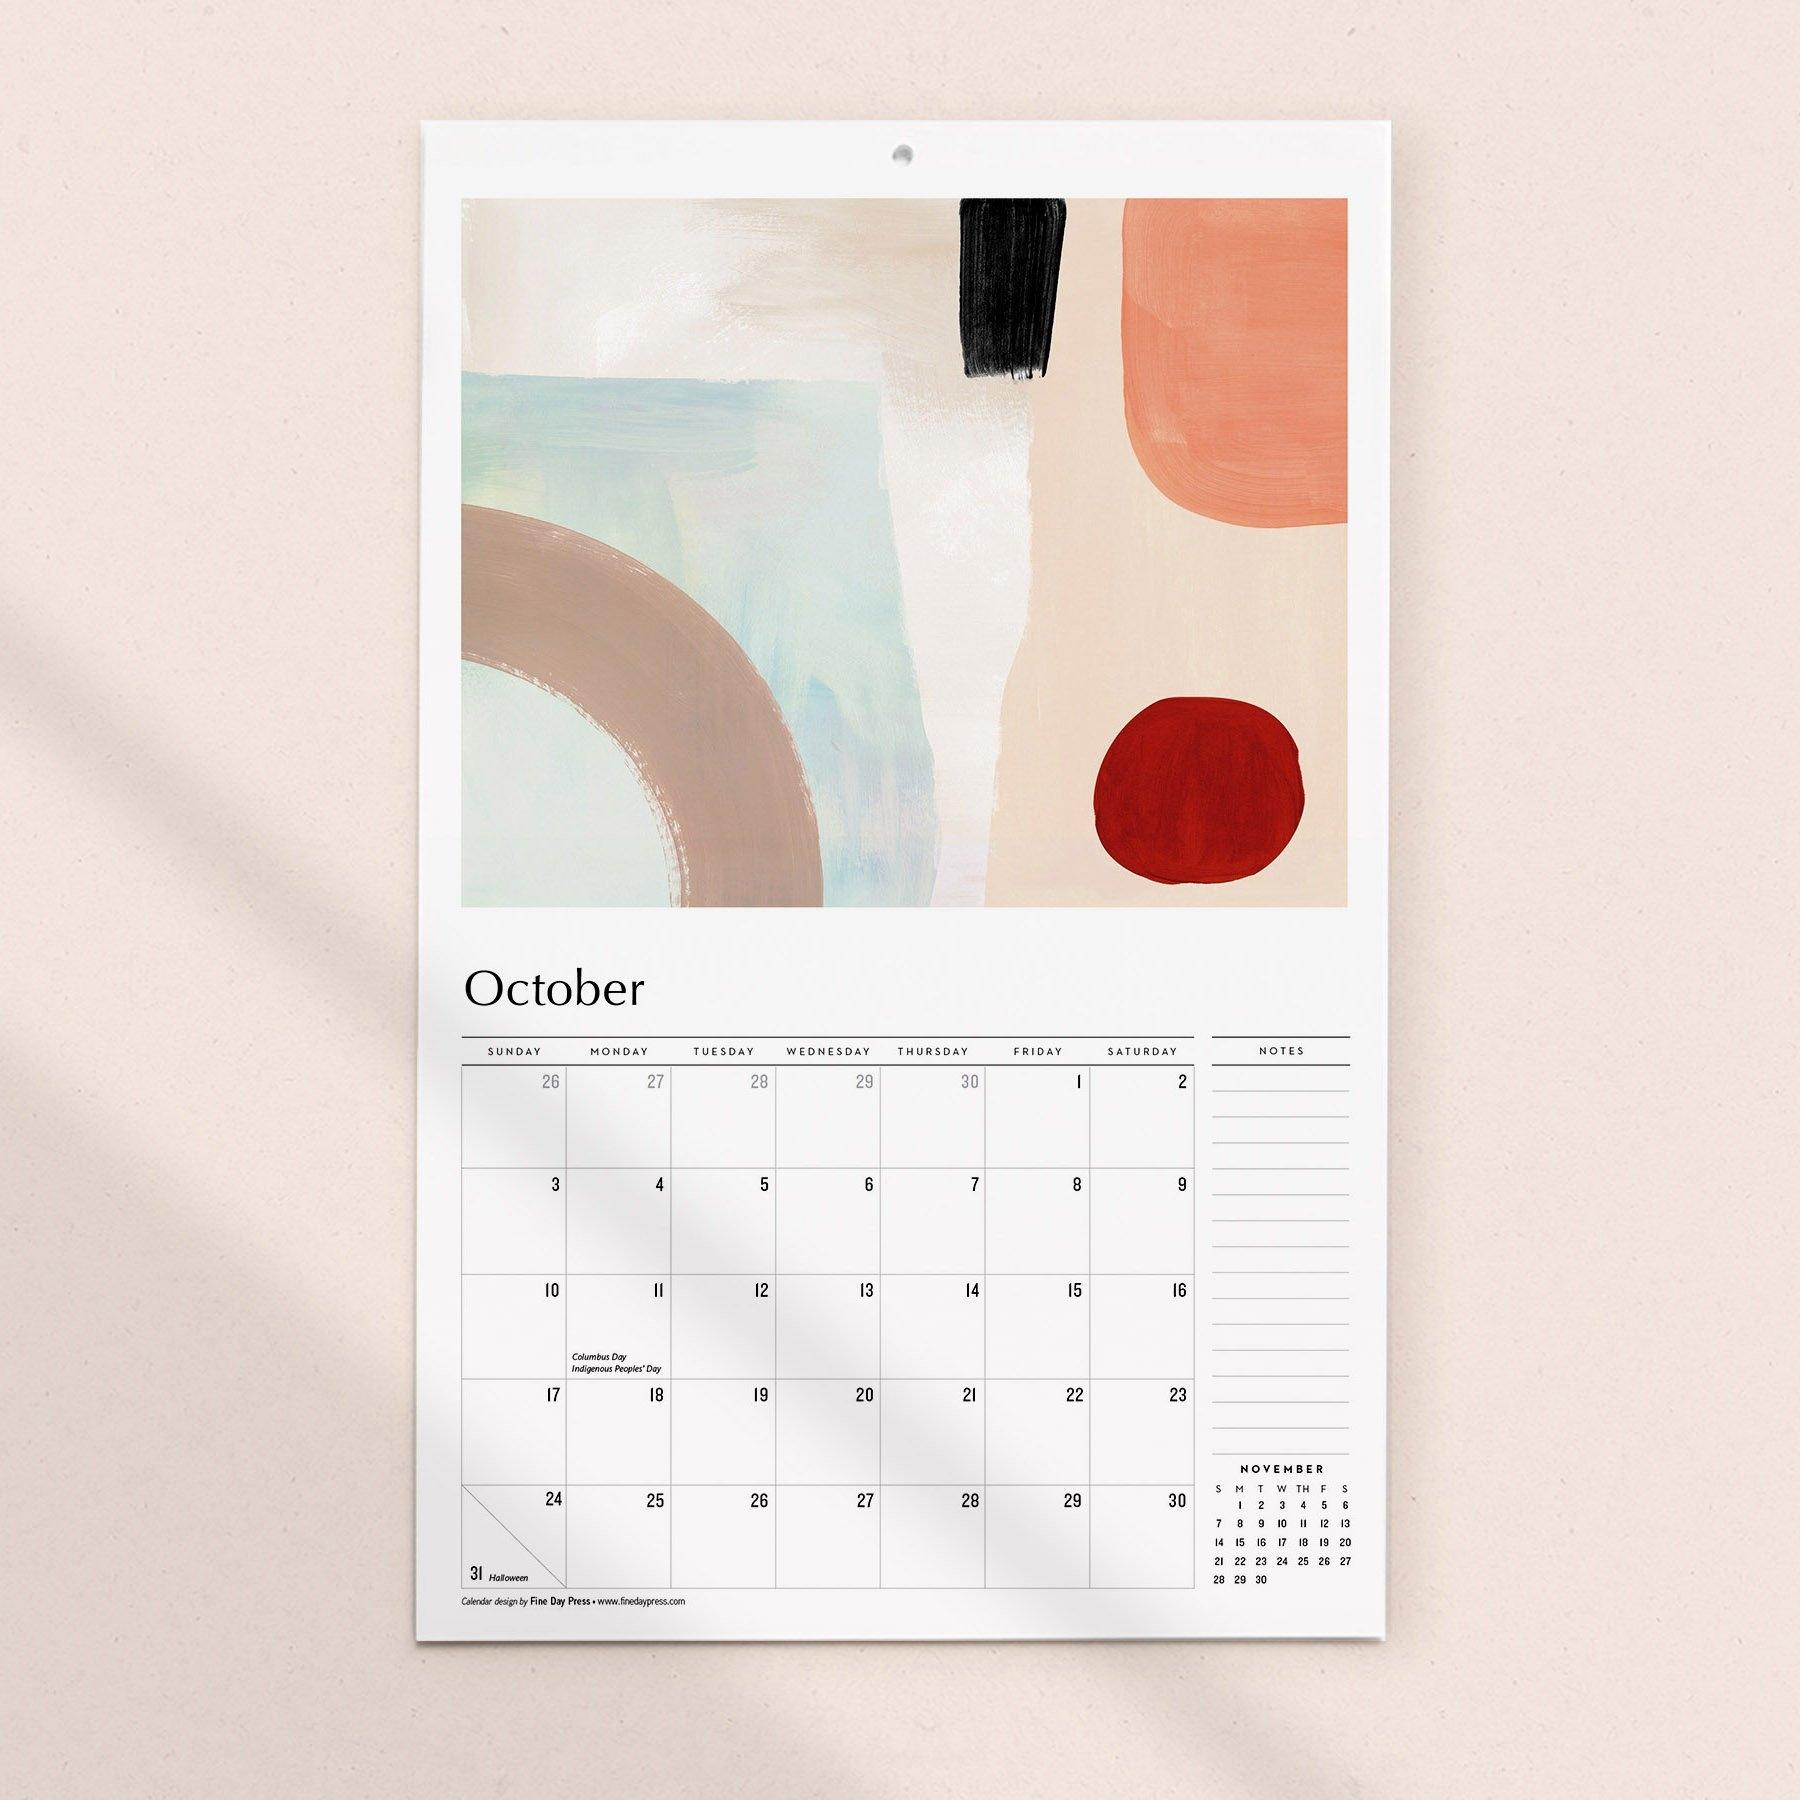 2021 Wall Calendar - Fine Day Press regarding Free Calendars You Can Edit 2021 8 1/2 X 11